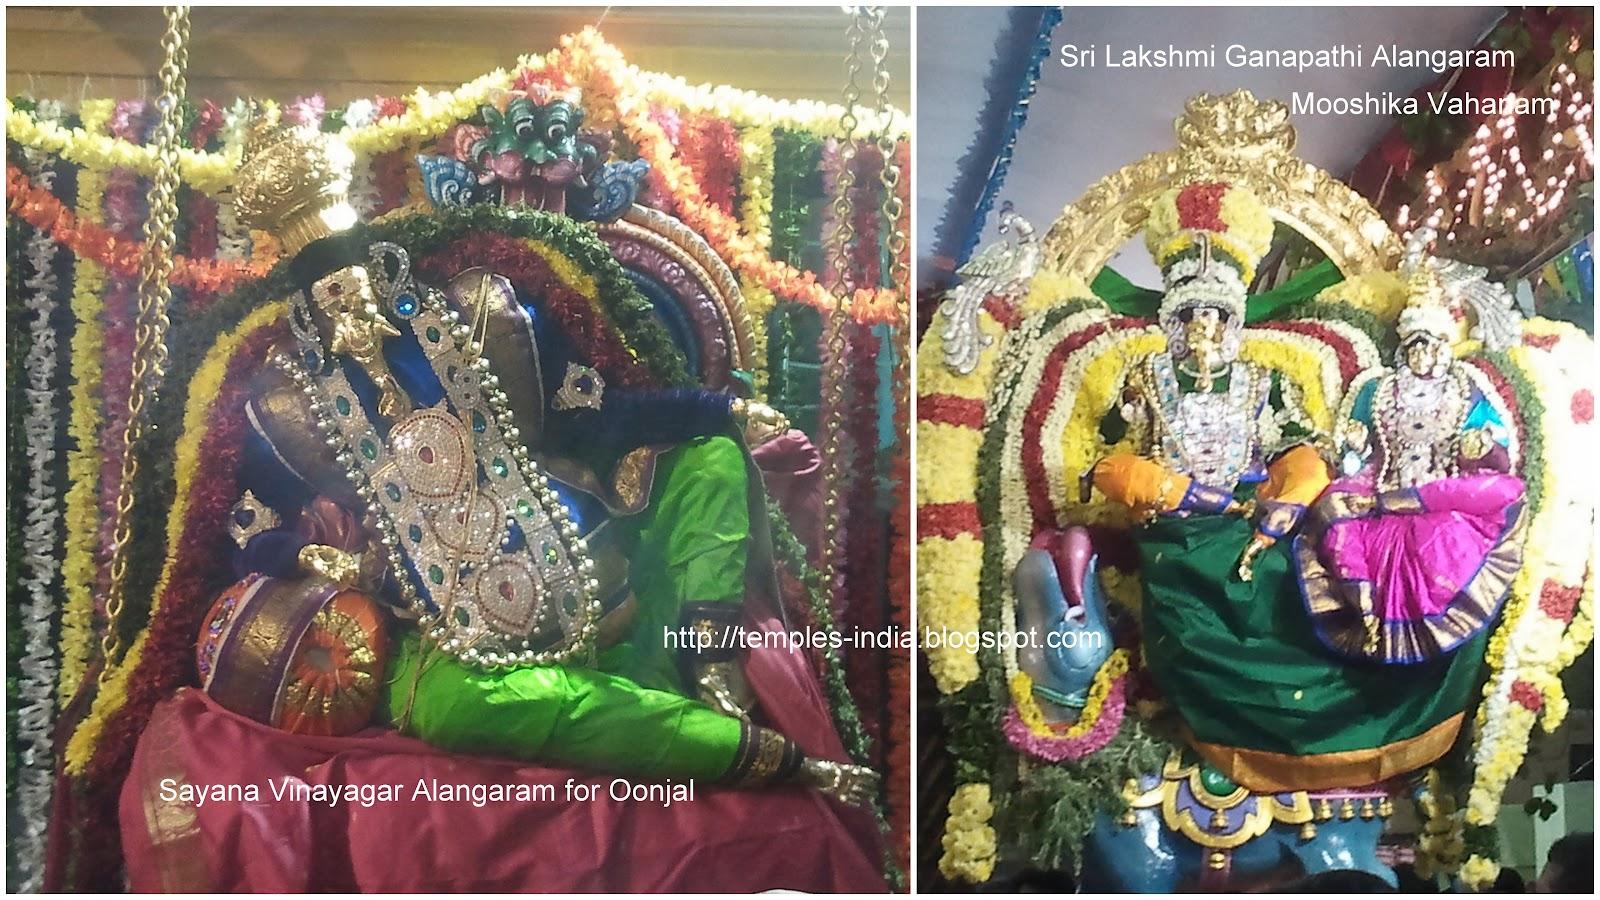 Bhoo varaha temple in bangalore dating 9